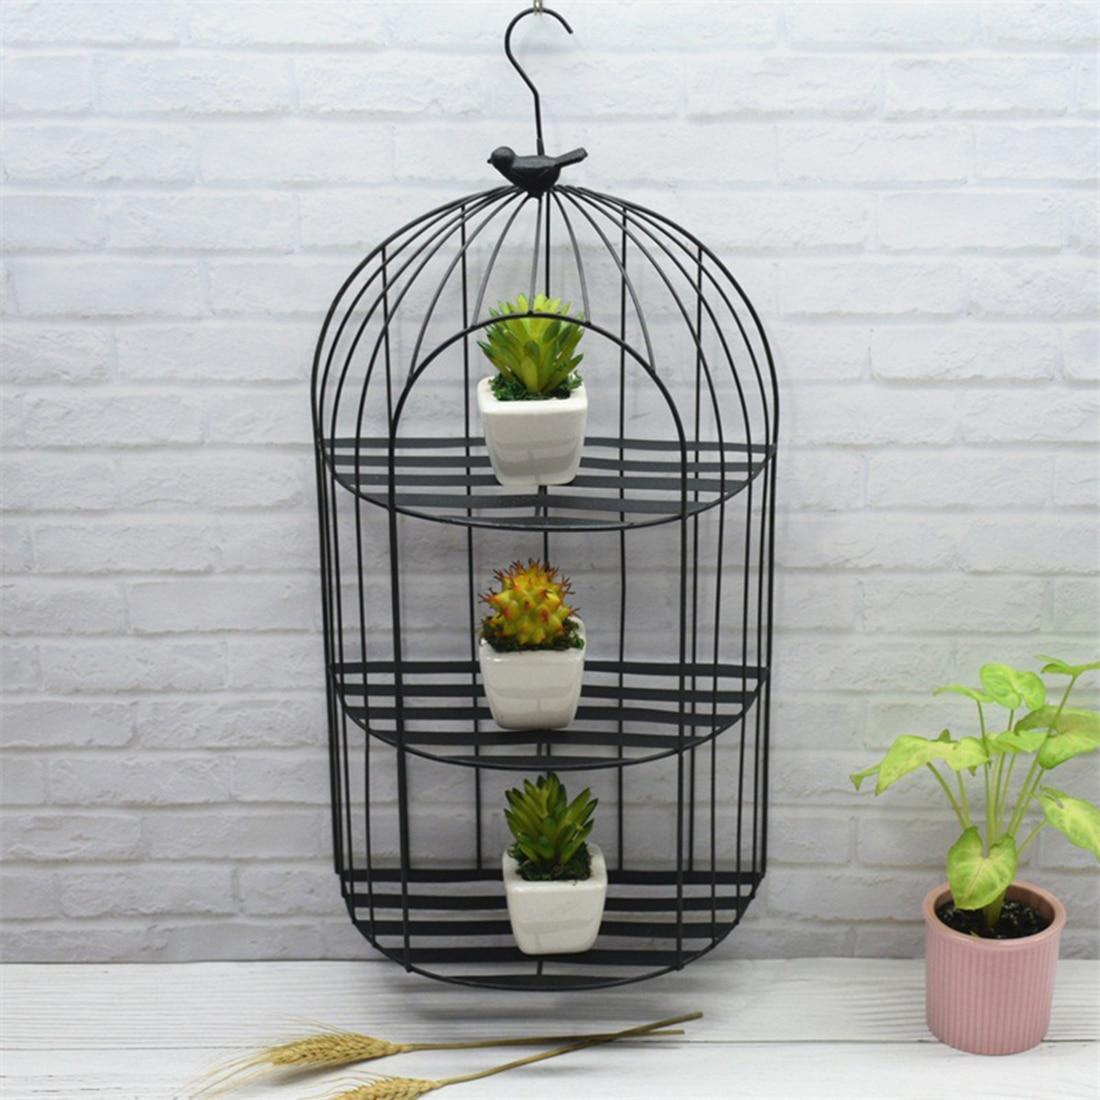 Birdcage Planter: New Nordic Style Birdcage Wall Flower Pot Storage Shelf